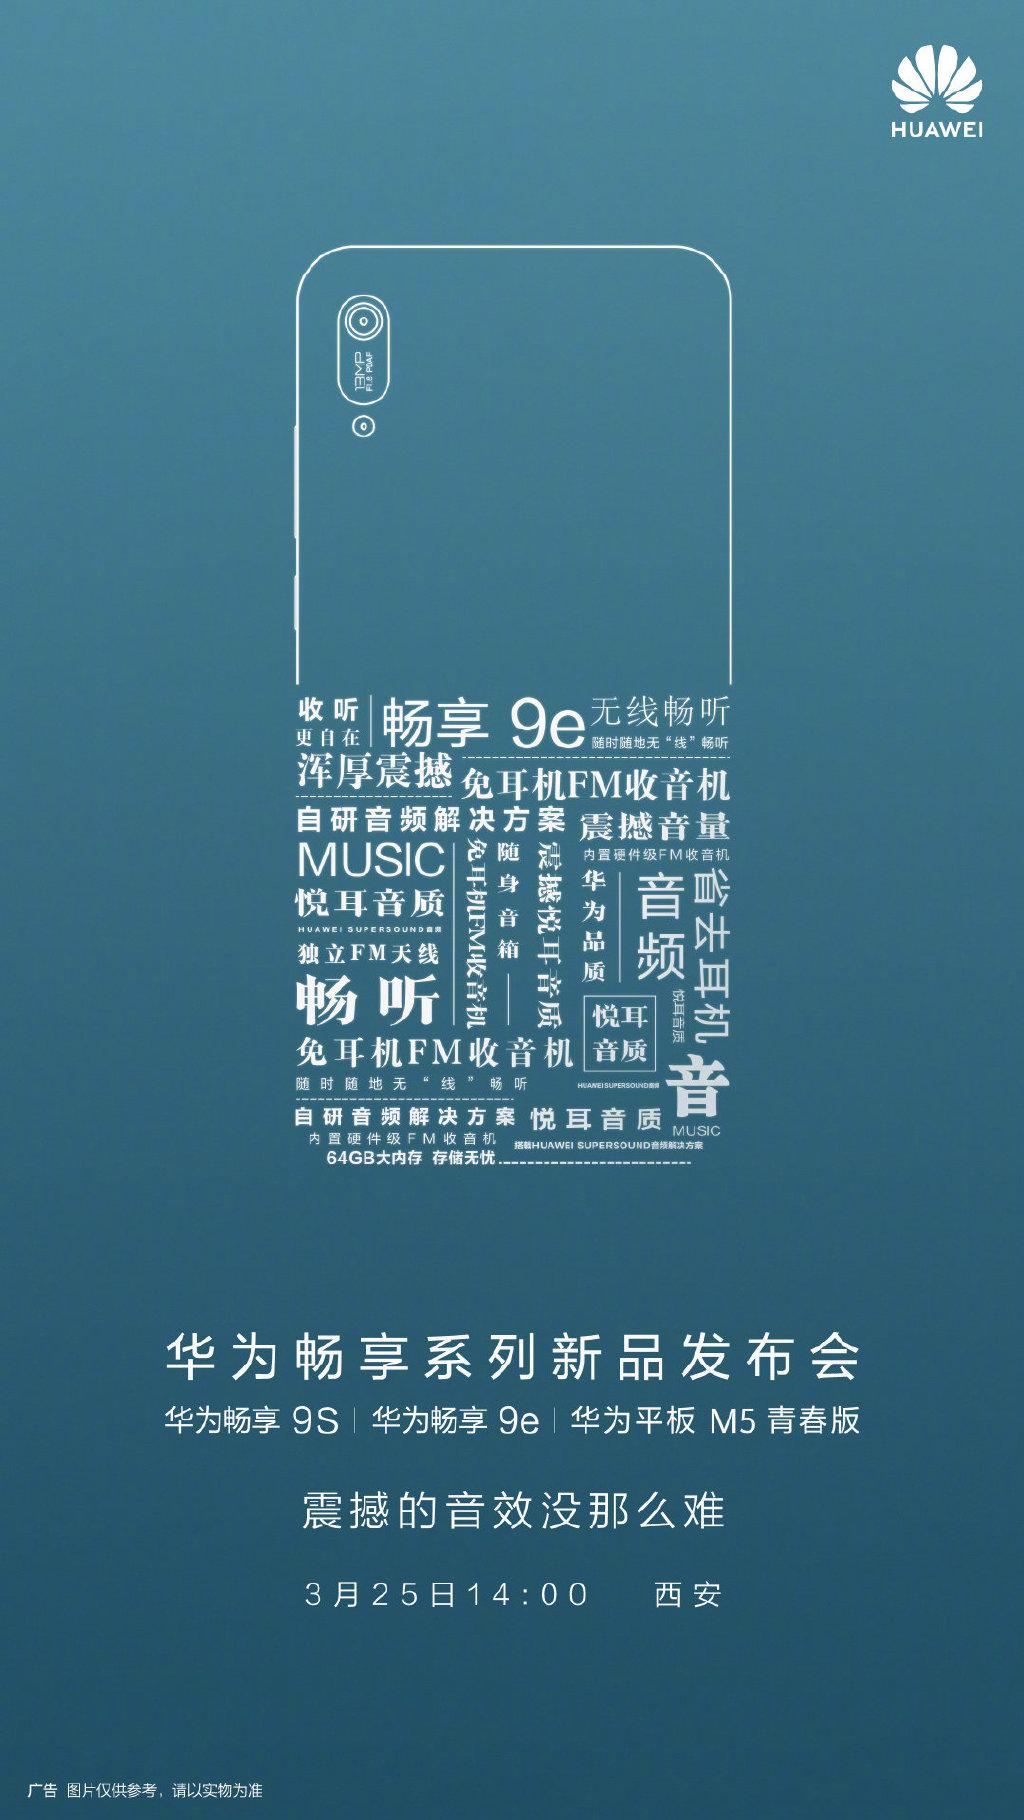 Huawei Enjoy 9e teaser